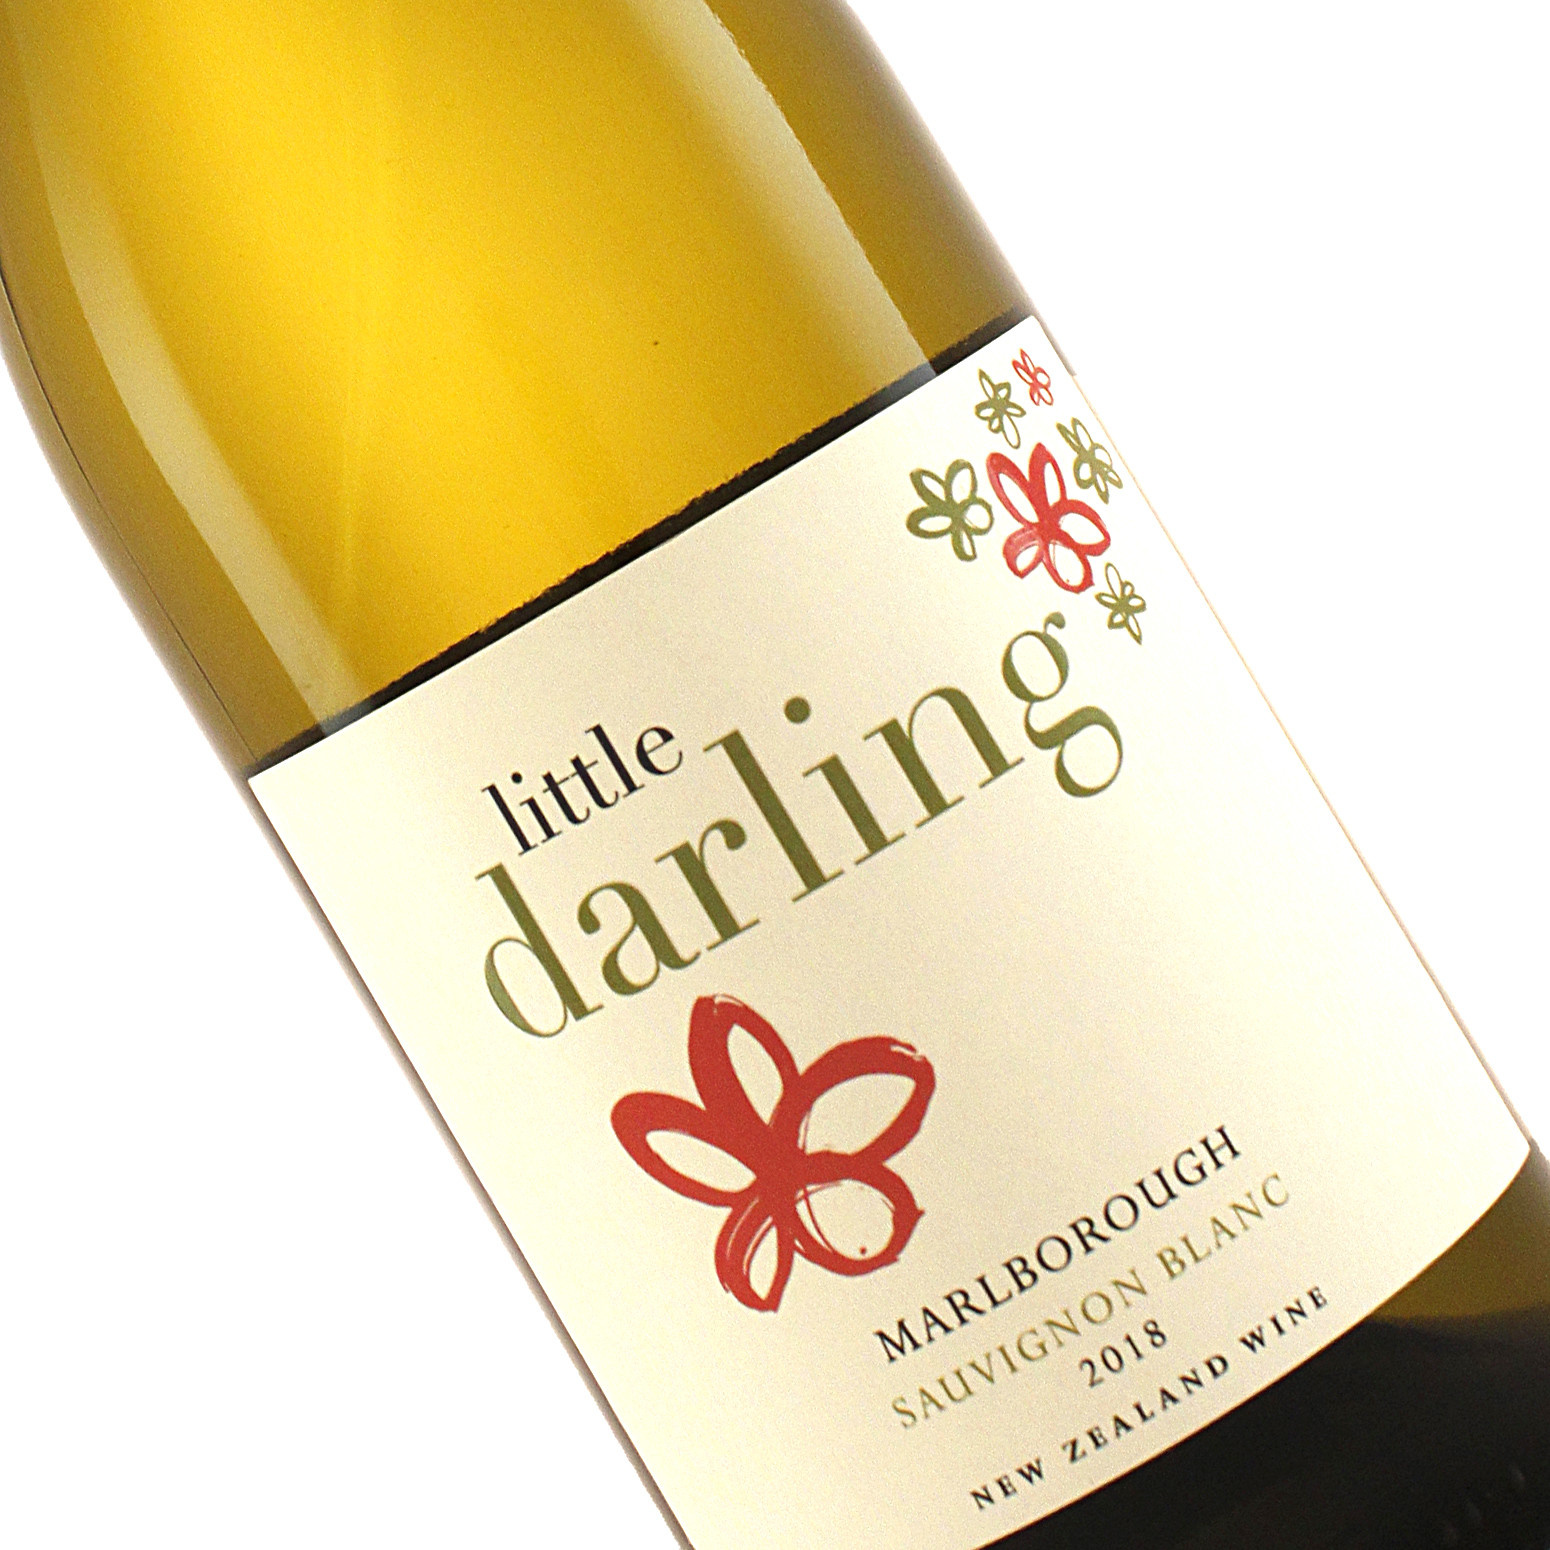 Little Darling 2018 Sauvignon Blanc Marlborough, New Zealand